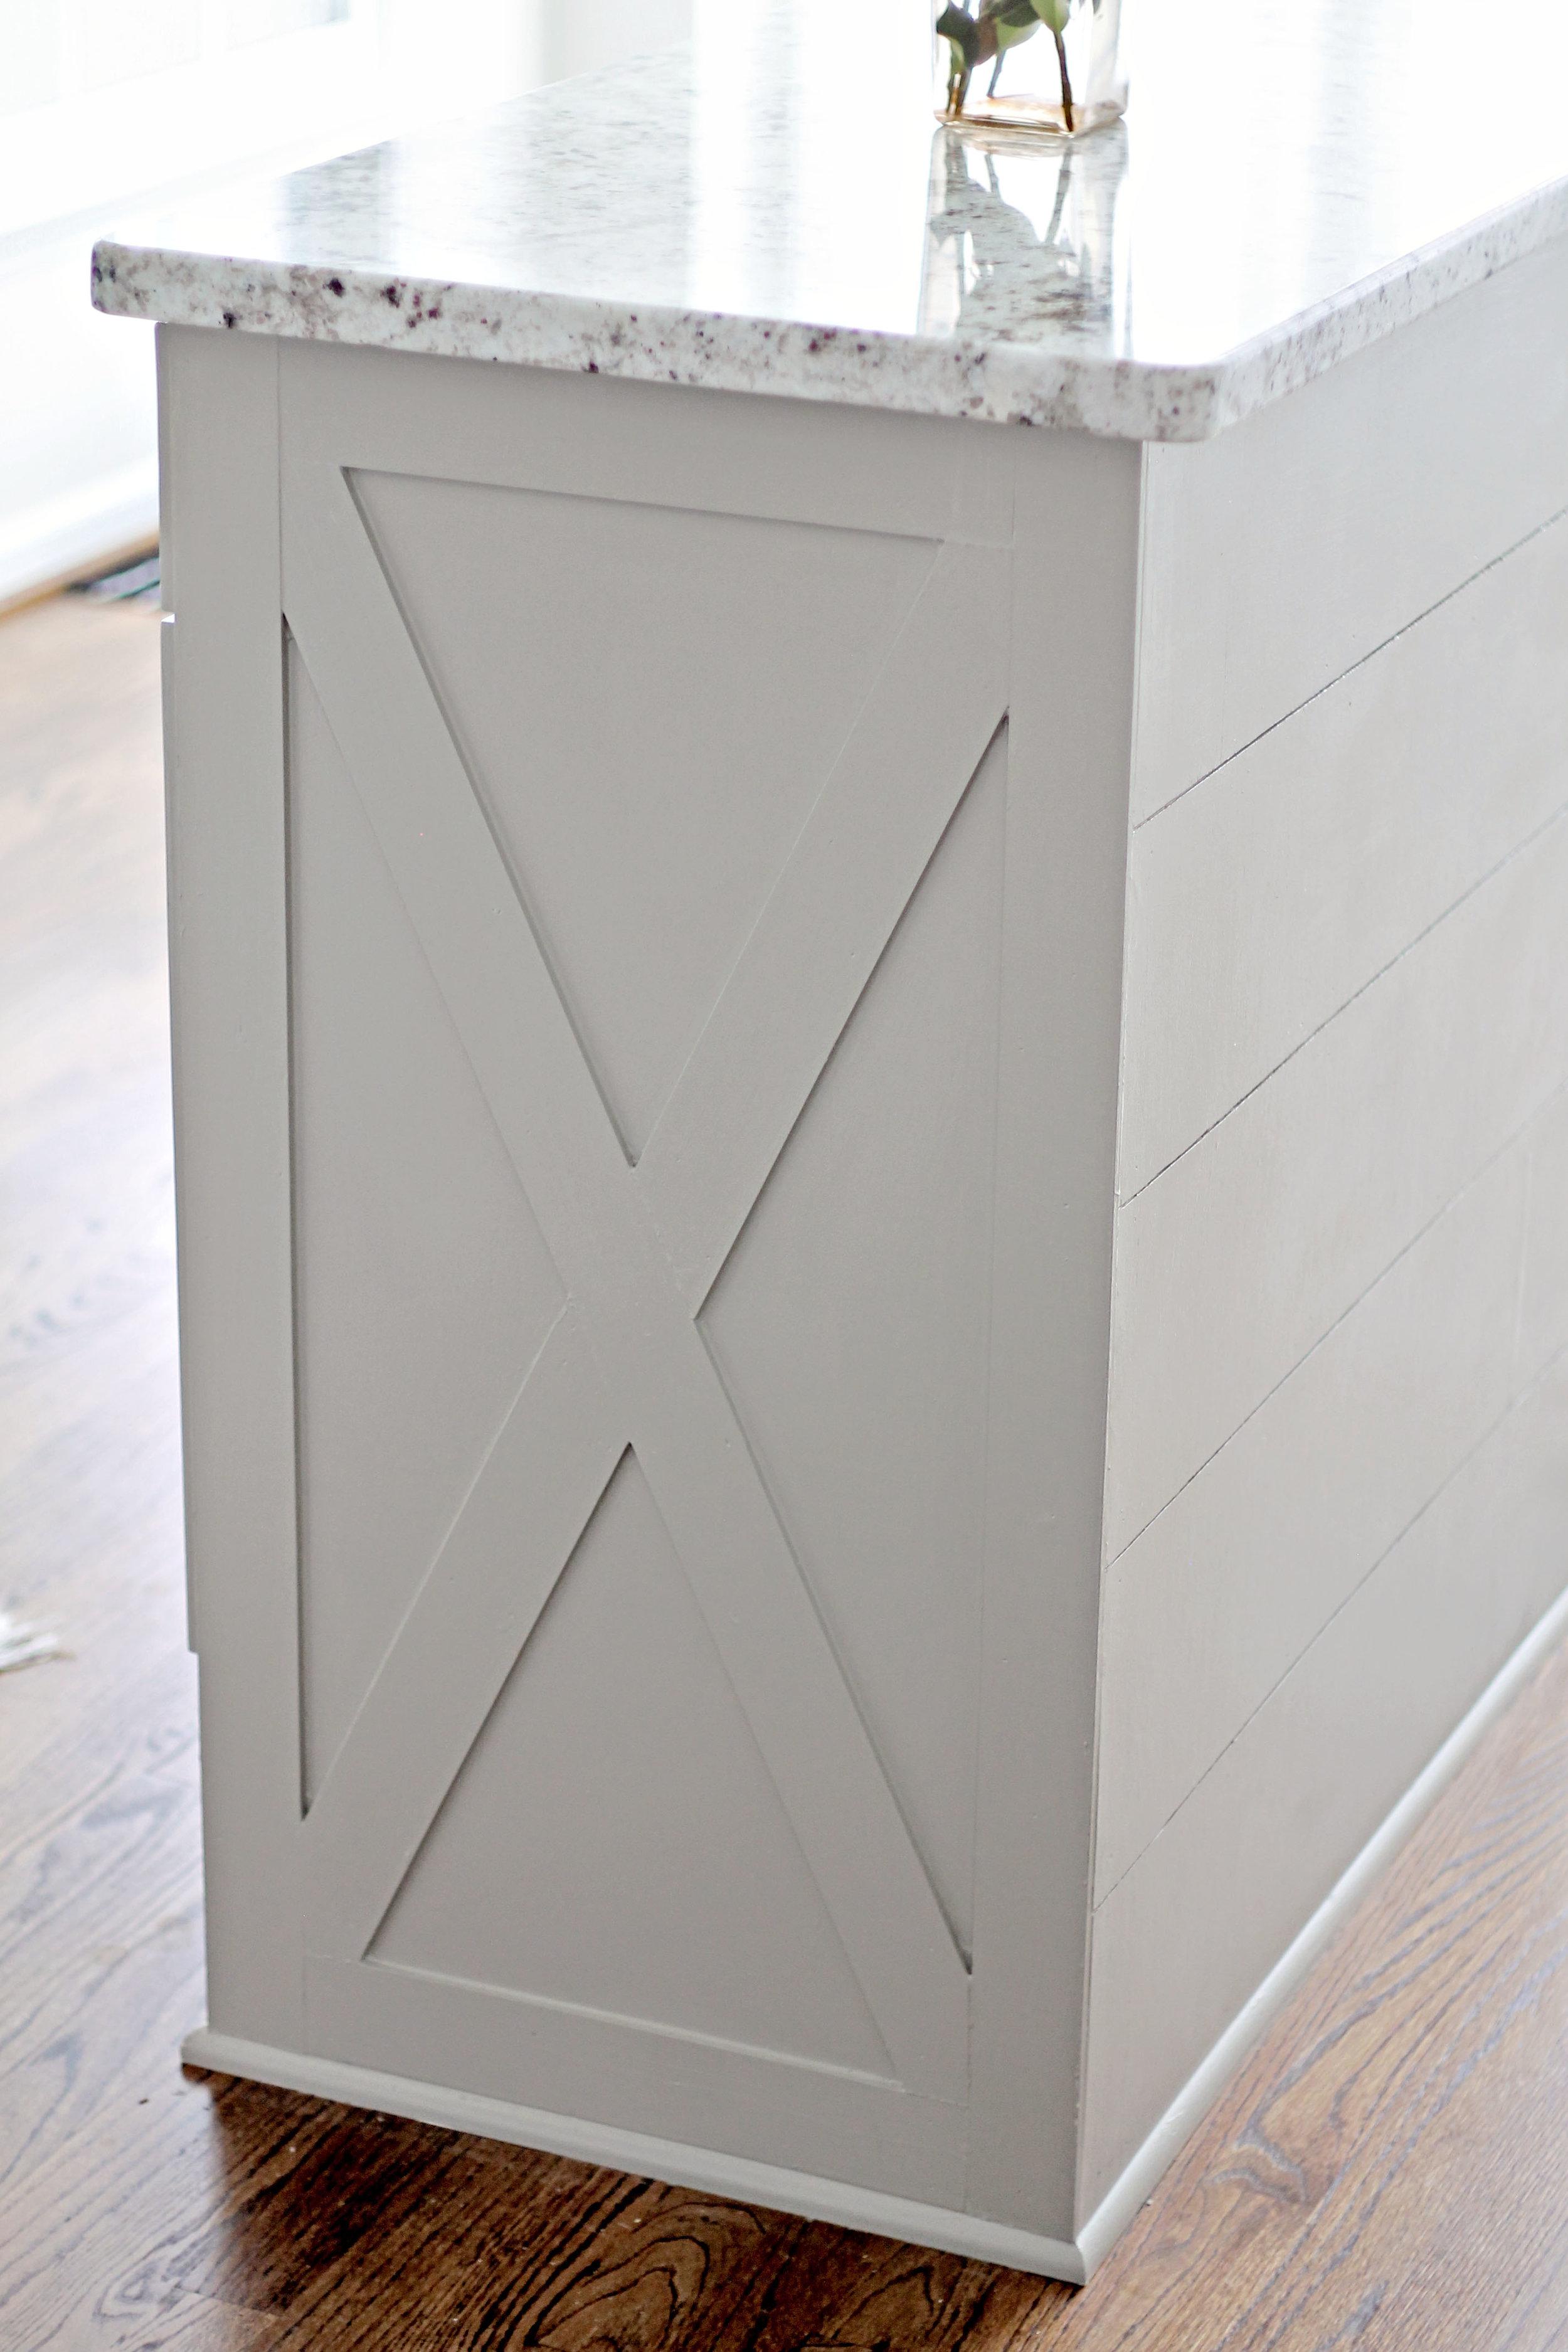 Elizabeth Burns | DIY Kitchen Island Makeover X Trim and Shiplap - Sherwin Williams Dorian Gray Kitchen Remodel